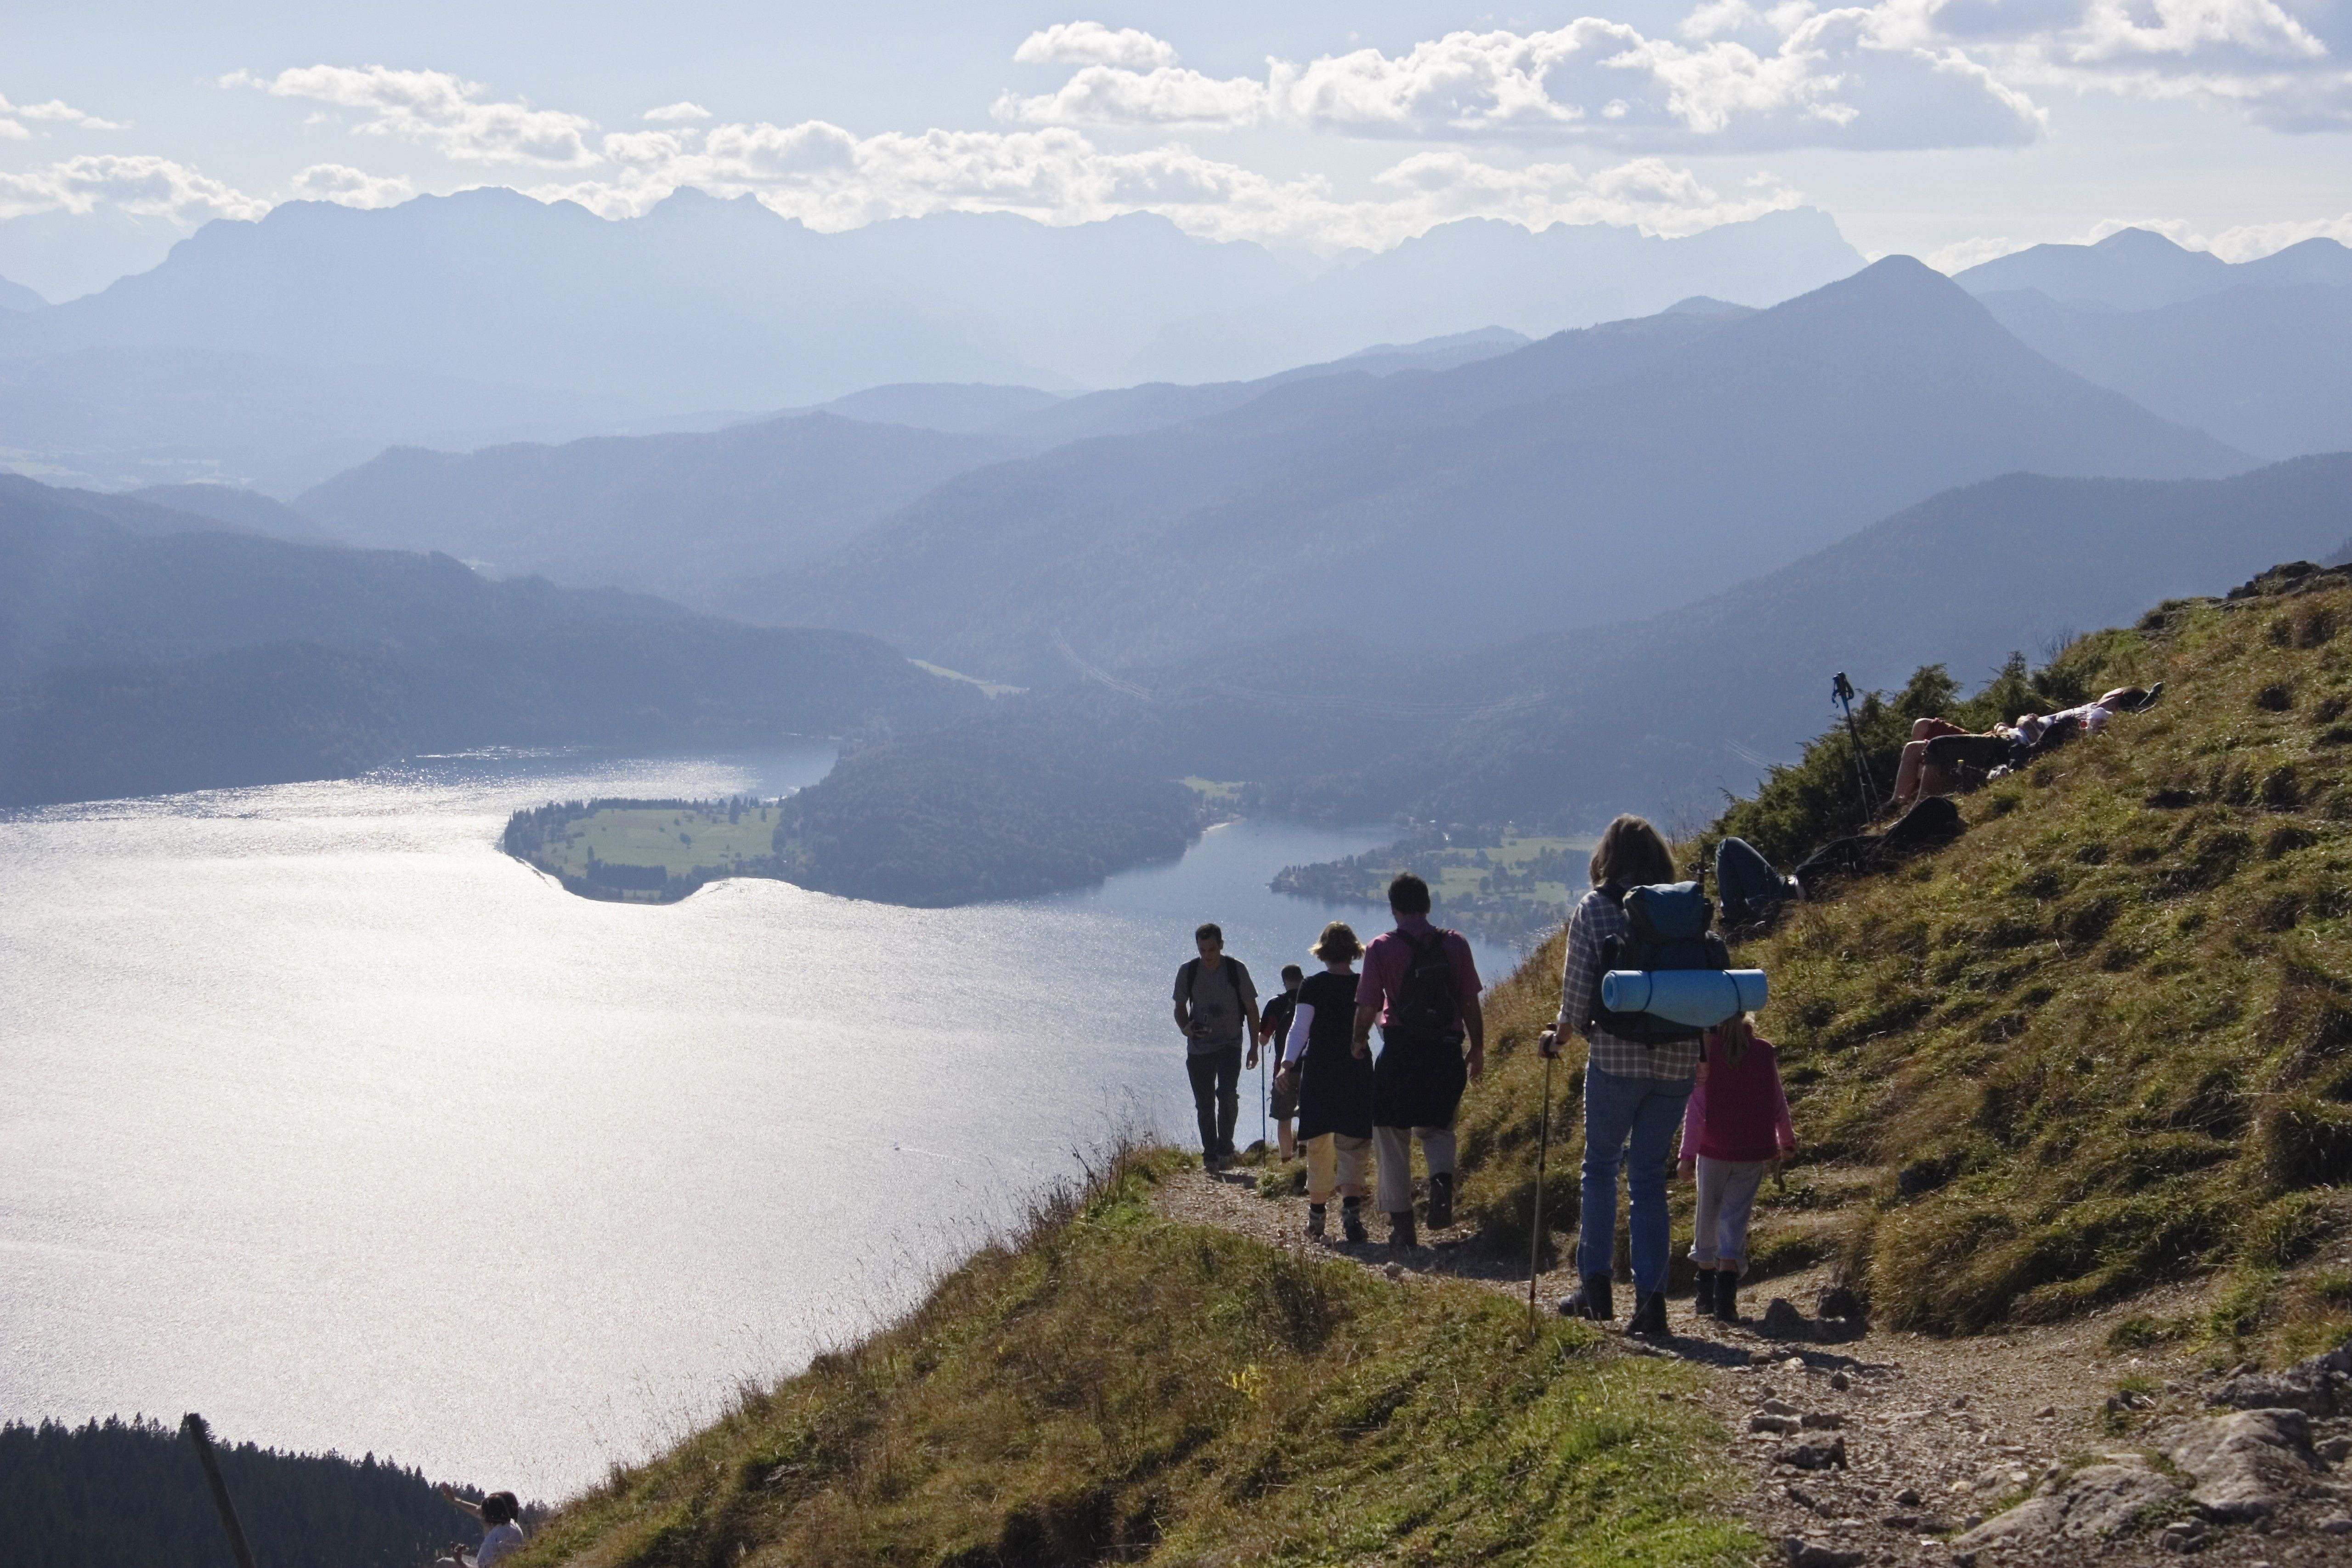 Hikers at Walchensee, Upper Bavaria